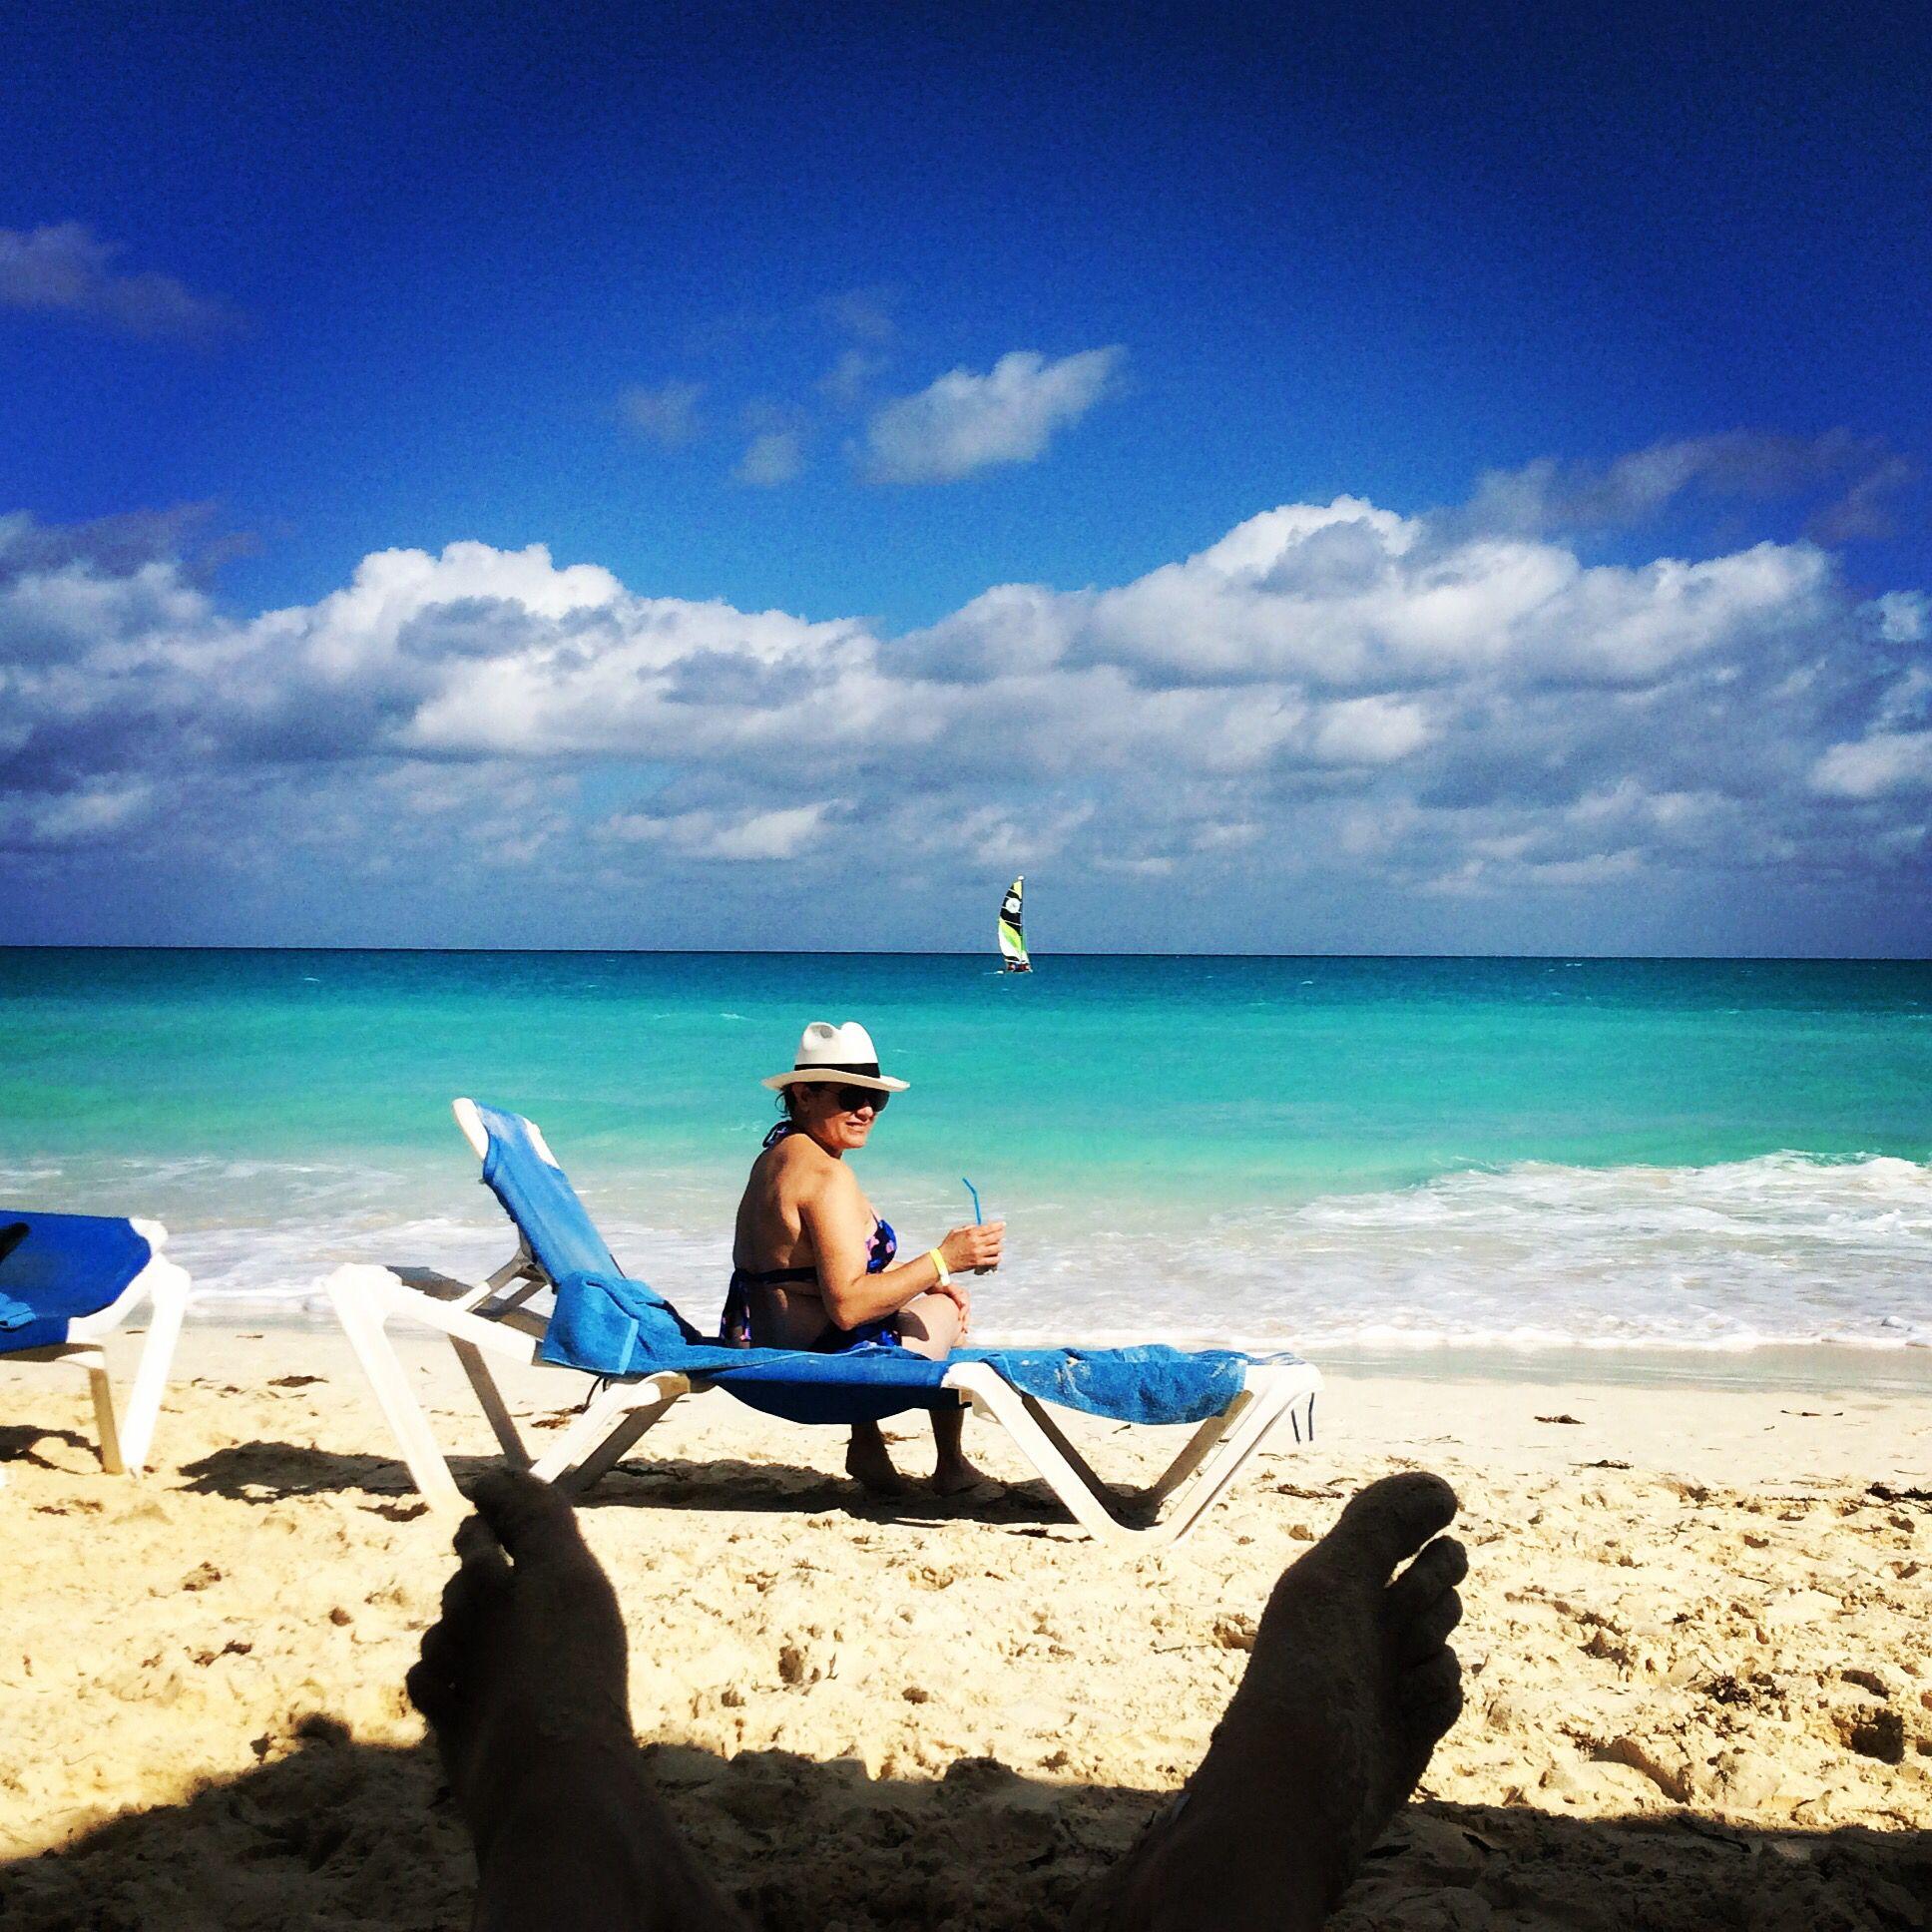 {title} (con imágenes) Mar caribe Caribe Cuba